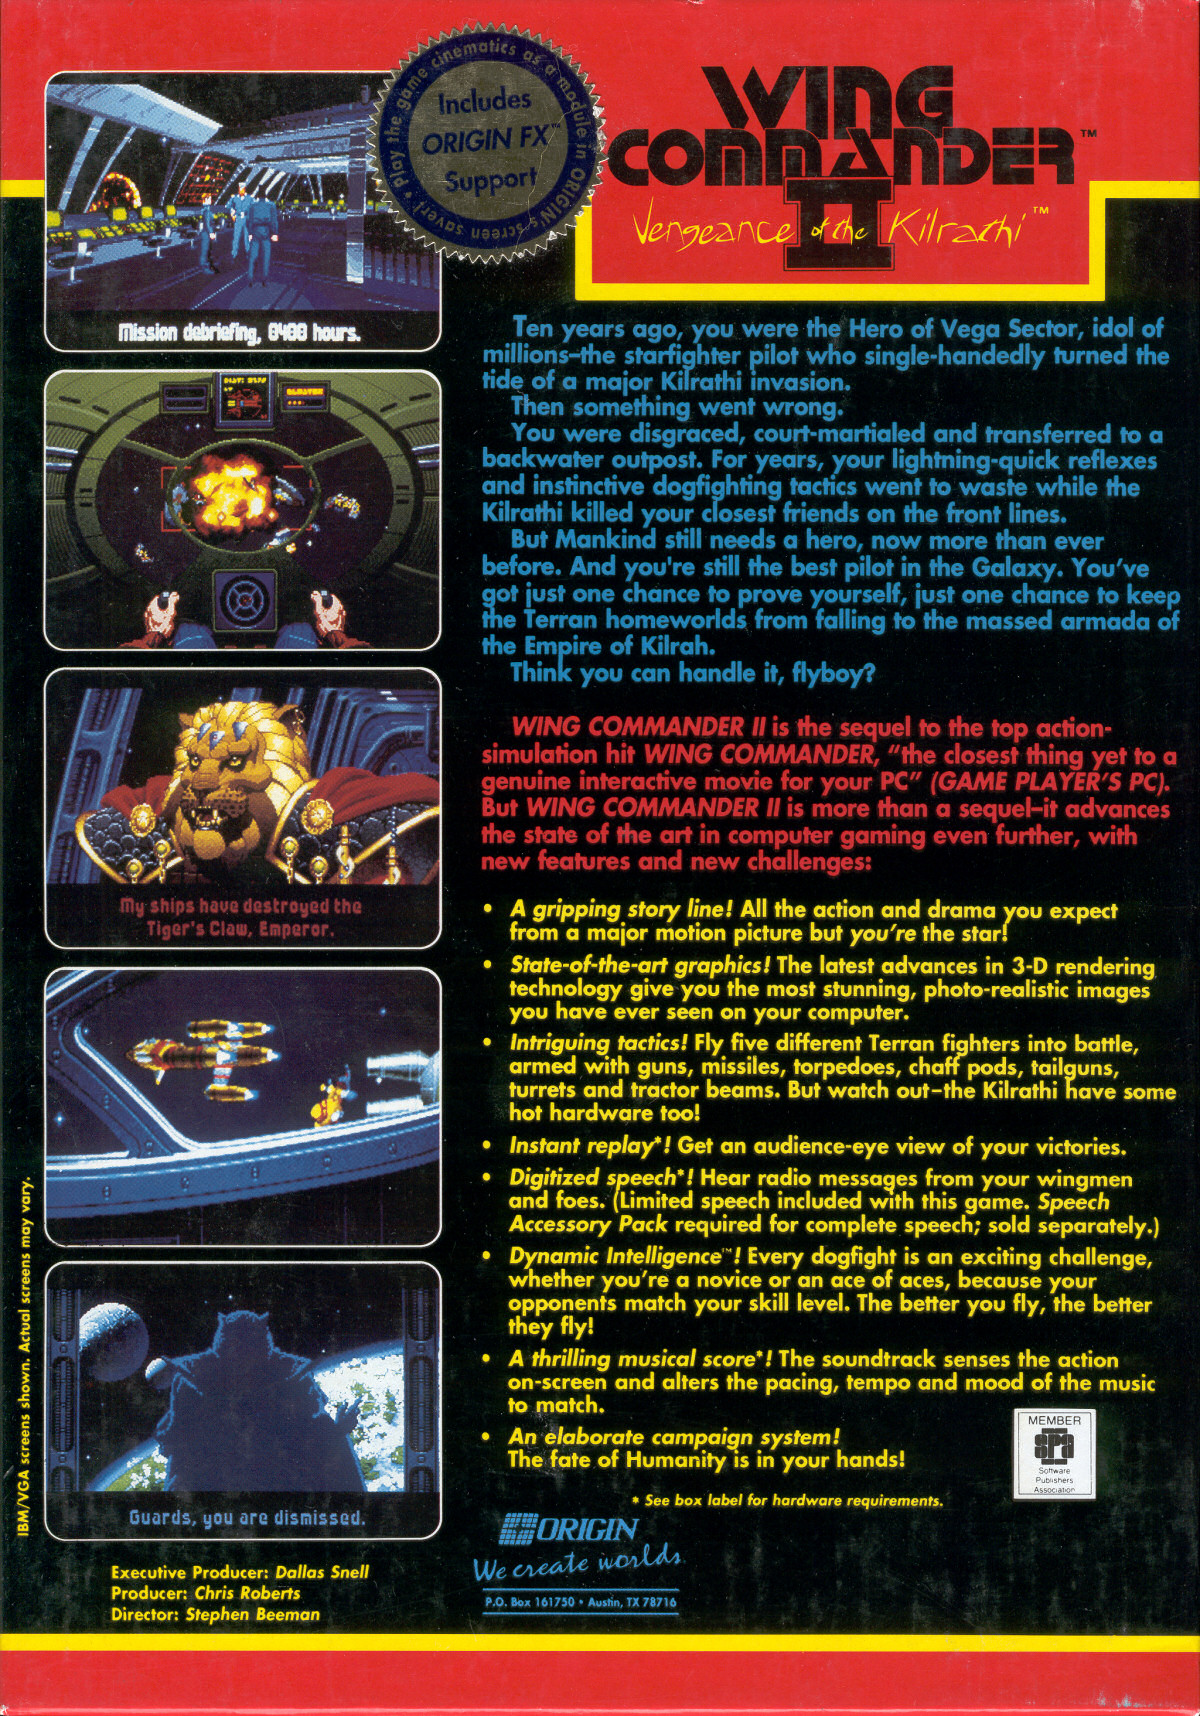 Wing Commander Ii Vengeance Of The Kilrathi Series Background